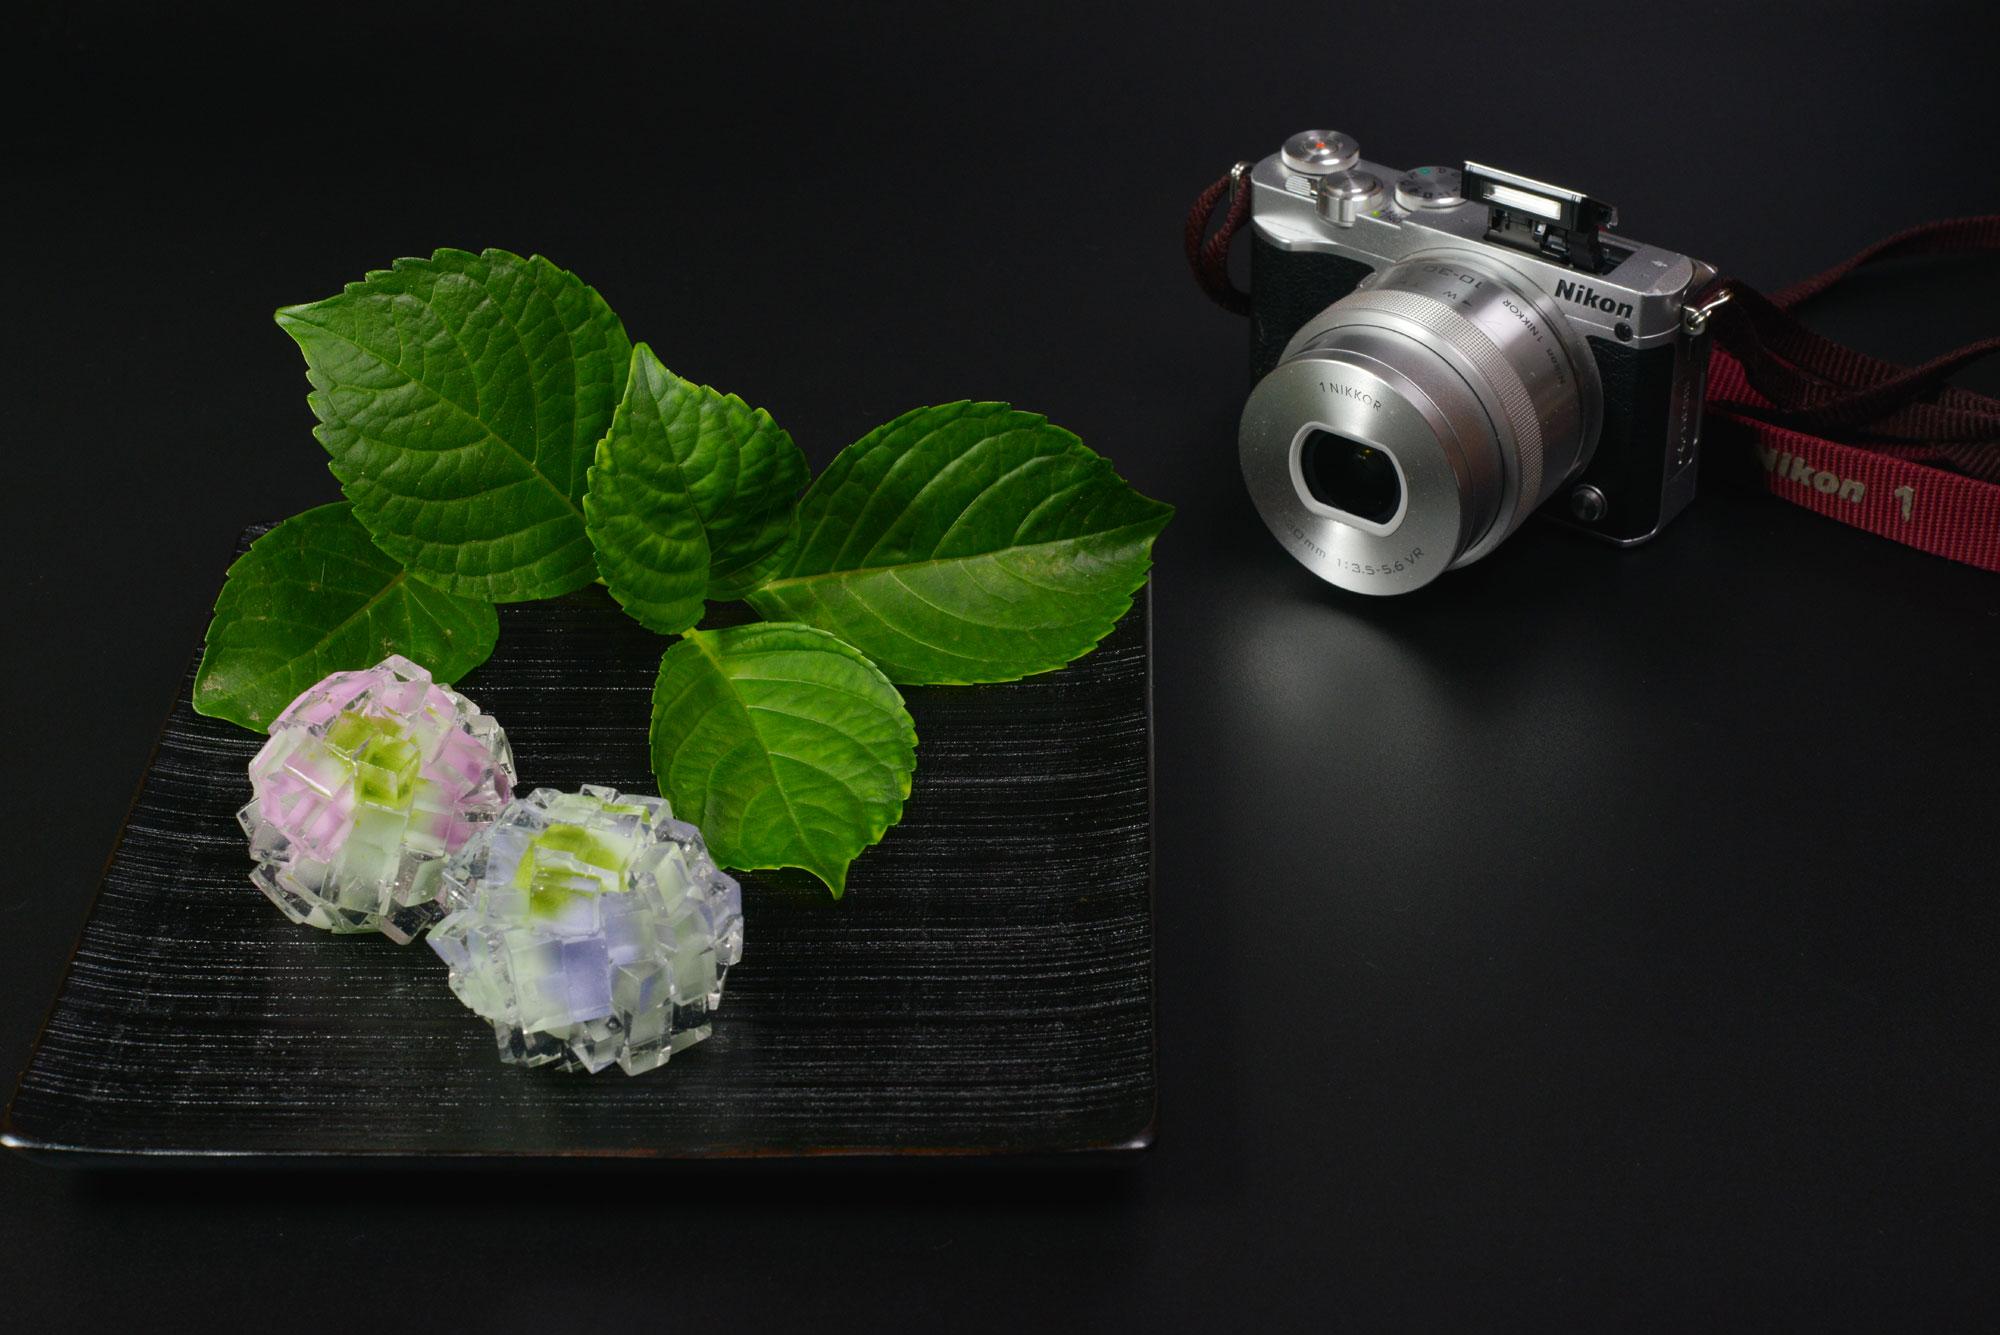 Nikon1 j5でスタジオ用ストロボは、使えないのか? 使用出来た?